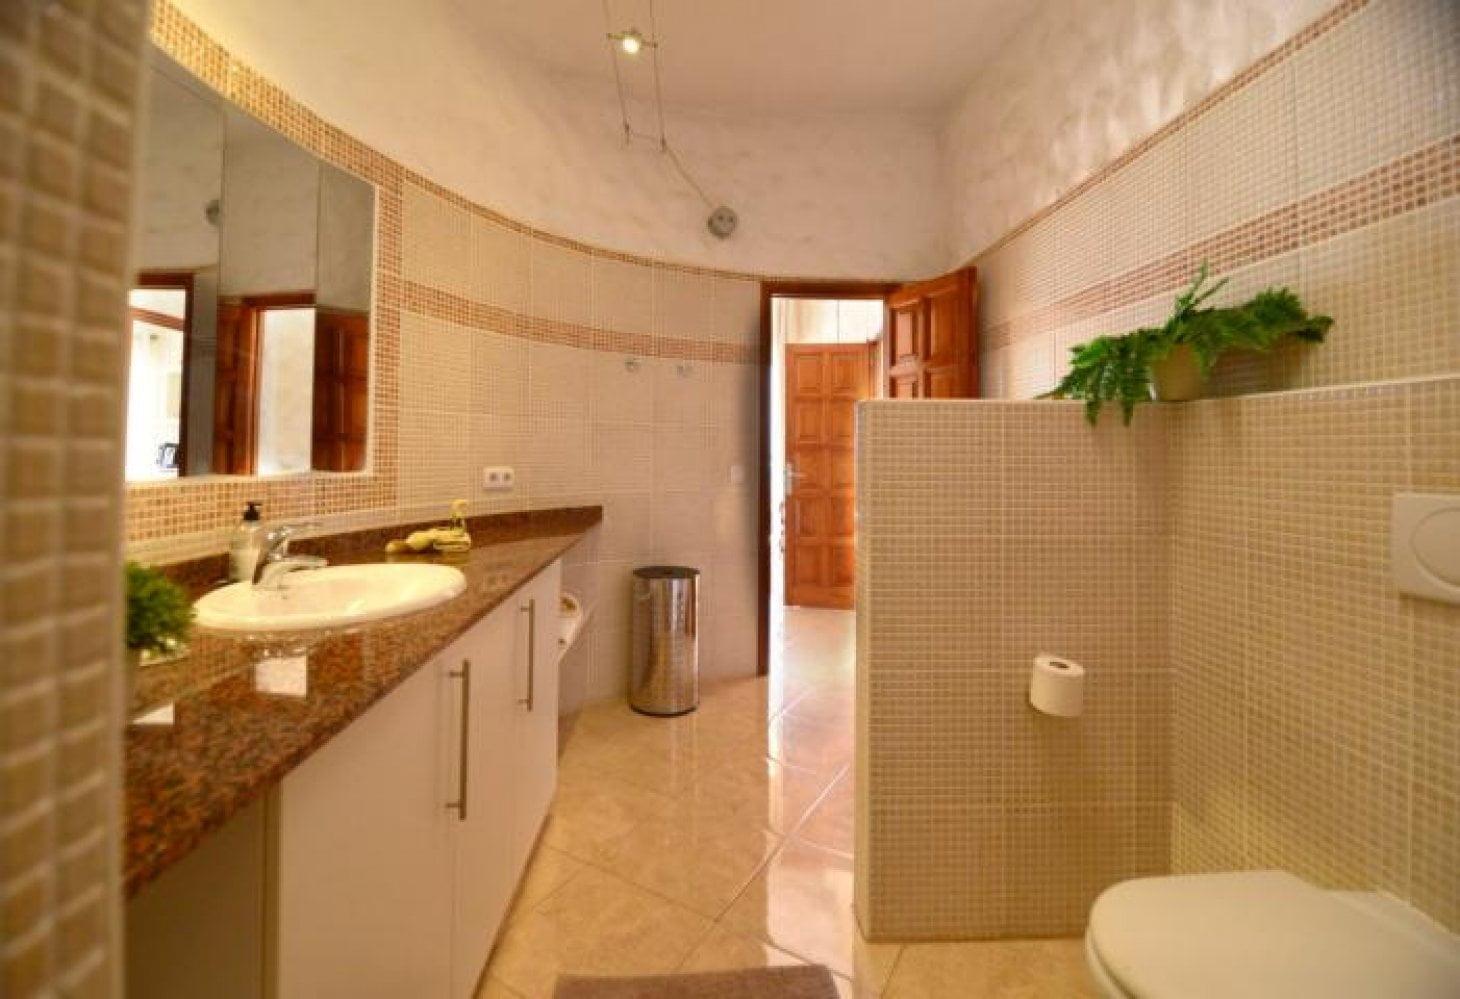 La Torre 2 - Expat beach house in Fuerteventura